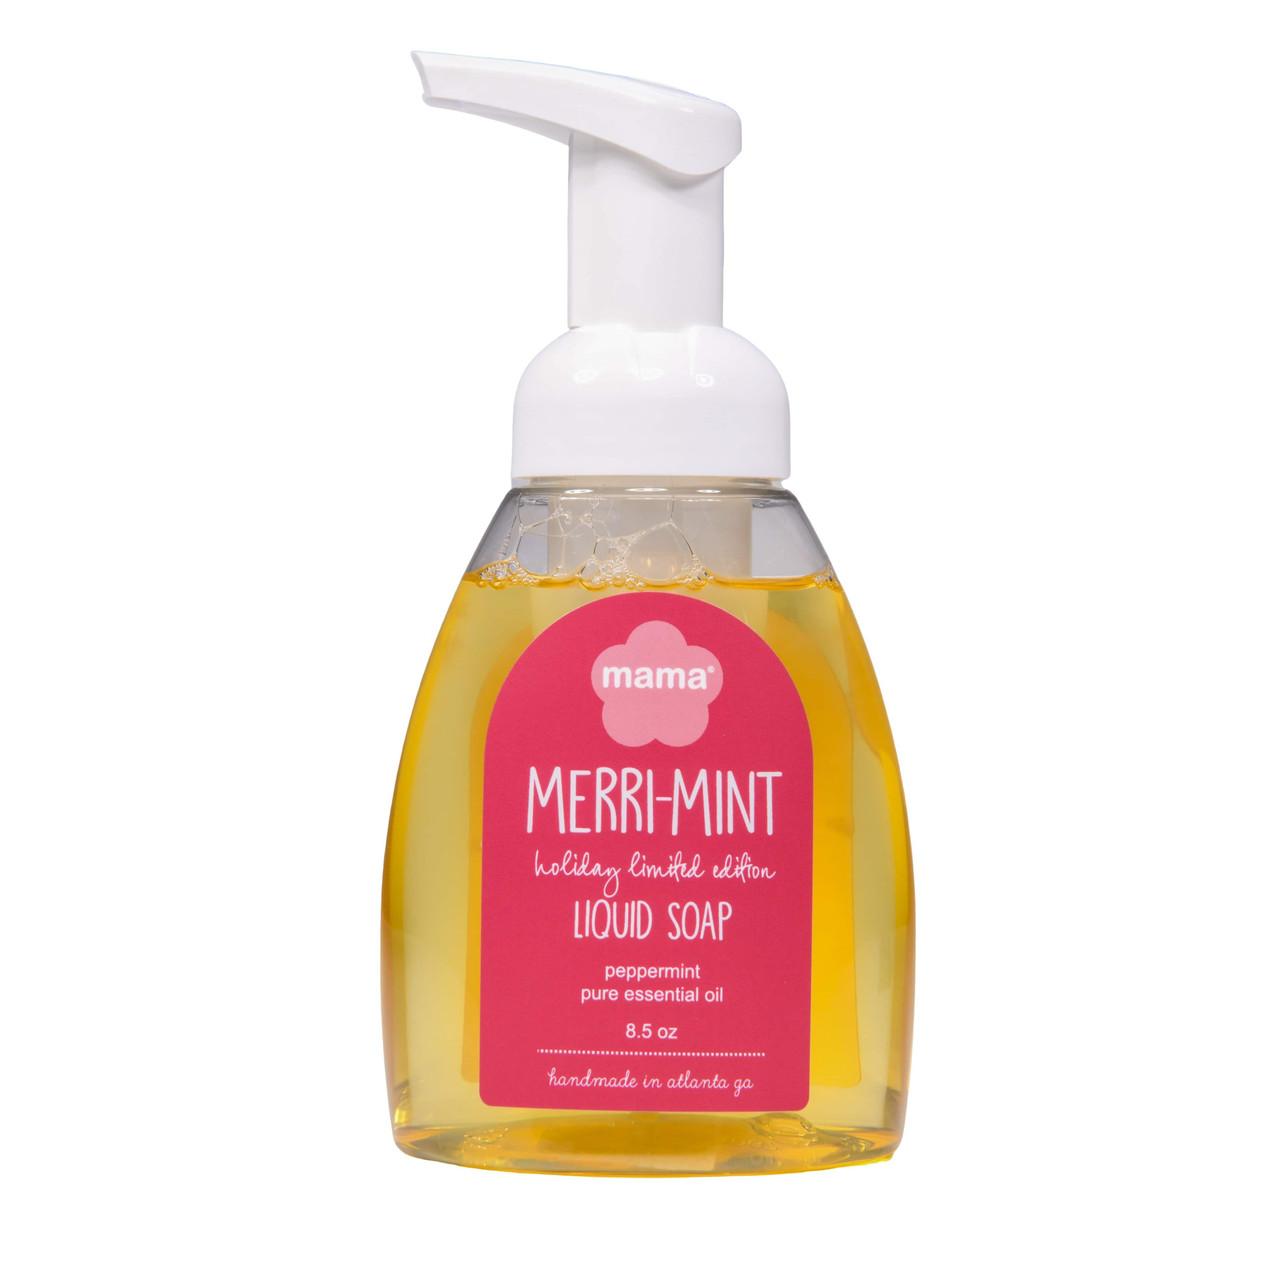 Merri-Mint Liquid Soap   Mama Bath + Body